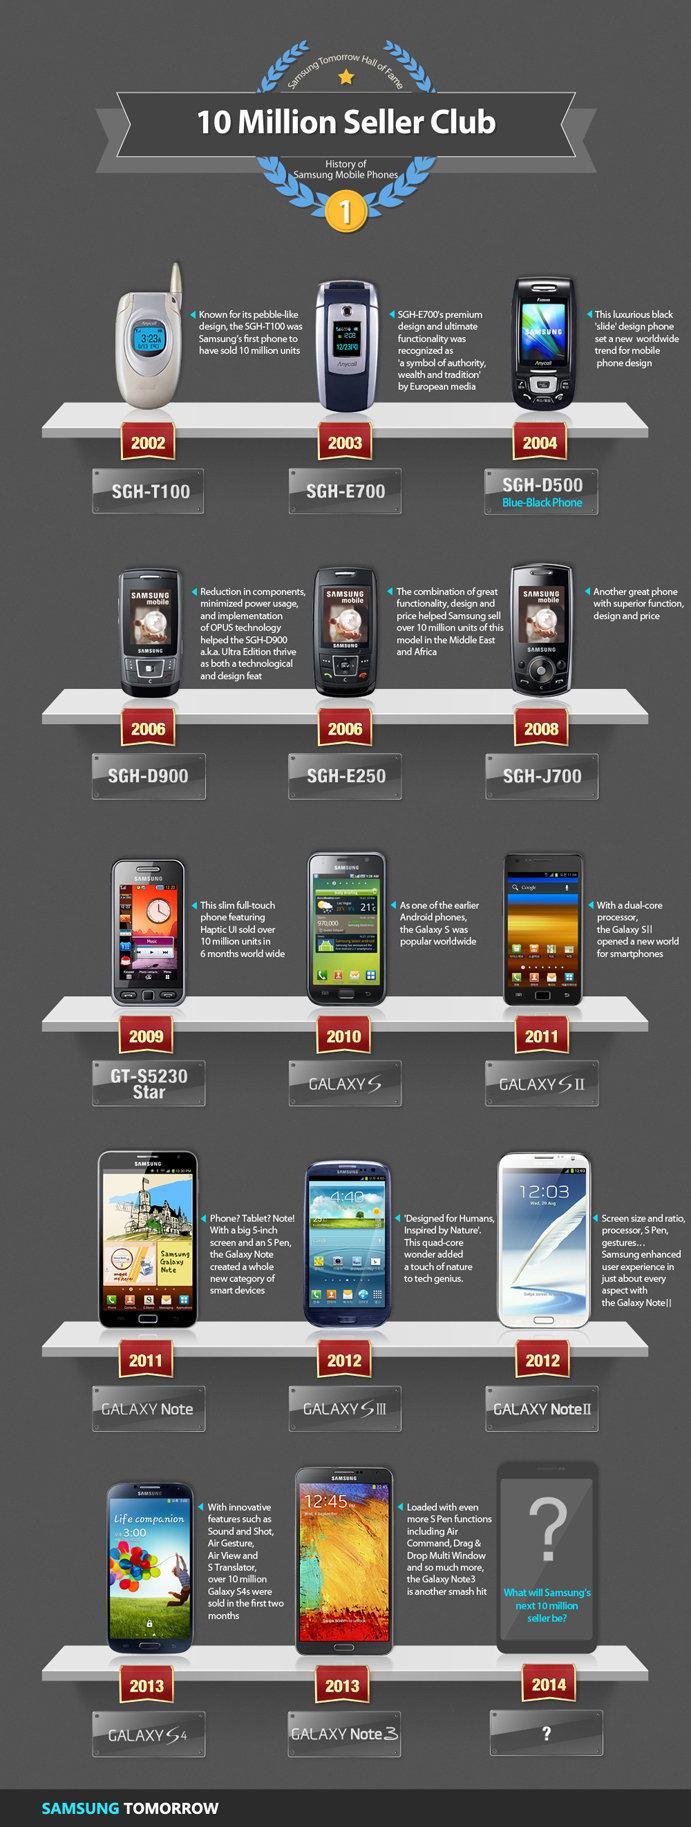 History of Samsung Mobile Phones: 10 Million Seller Club